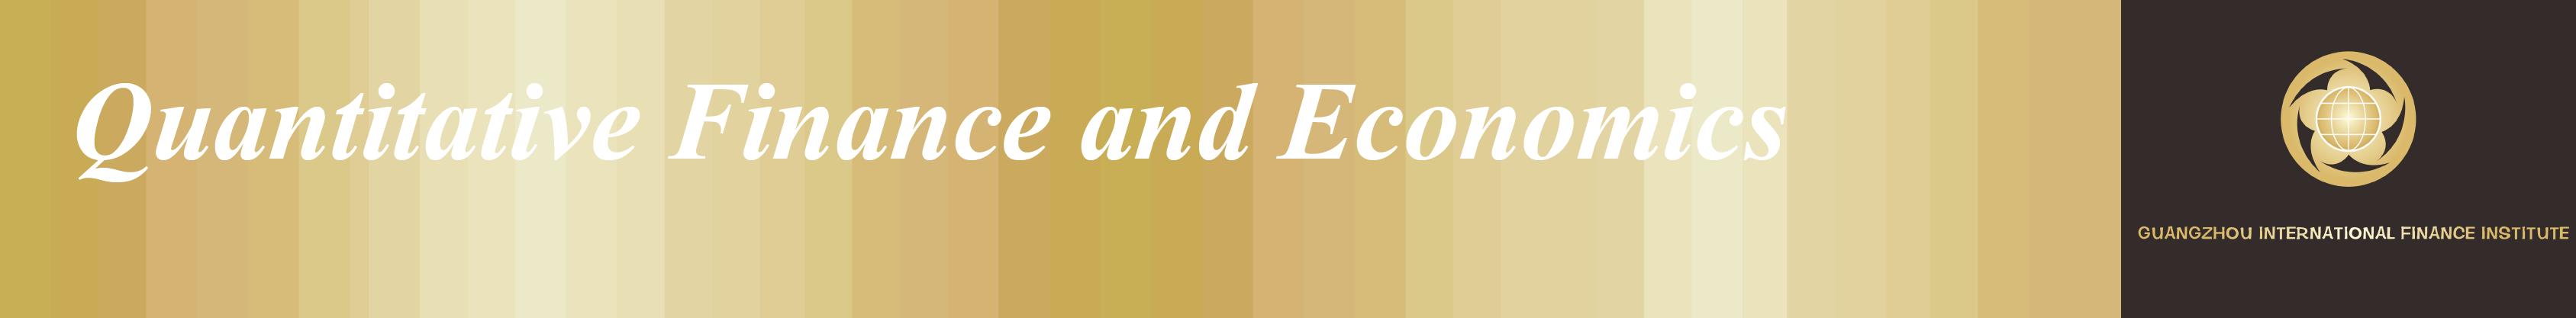 Quantitative Finance and Economics - Open Access Journals